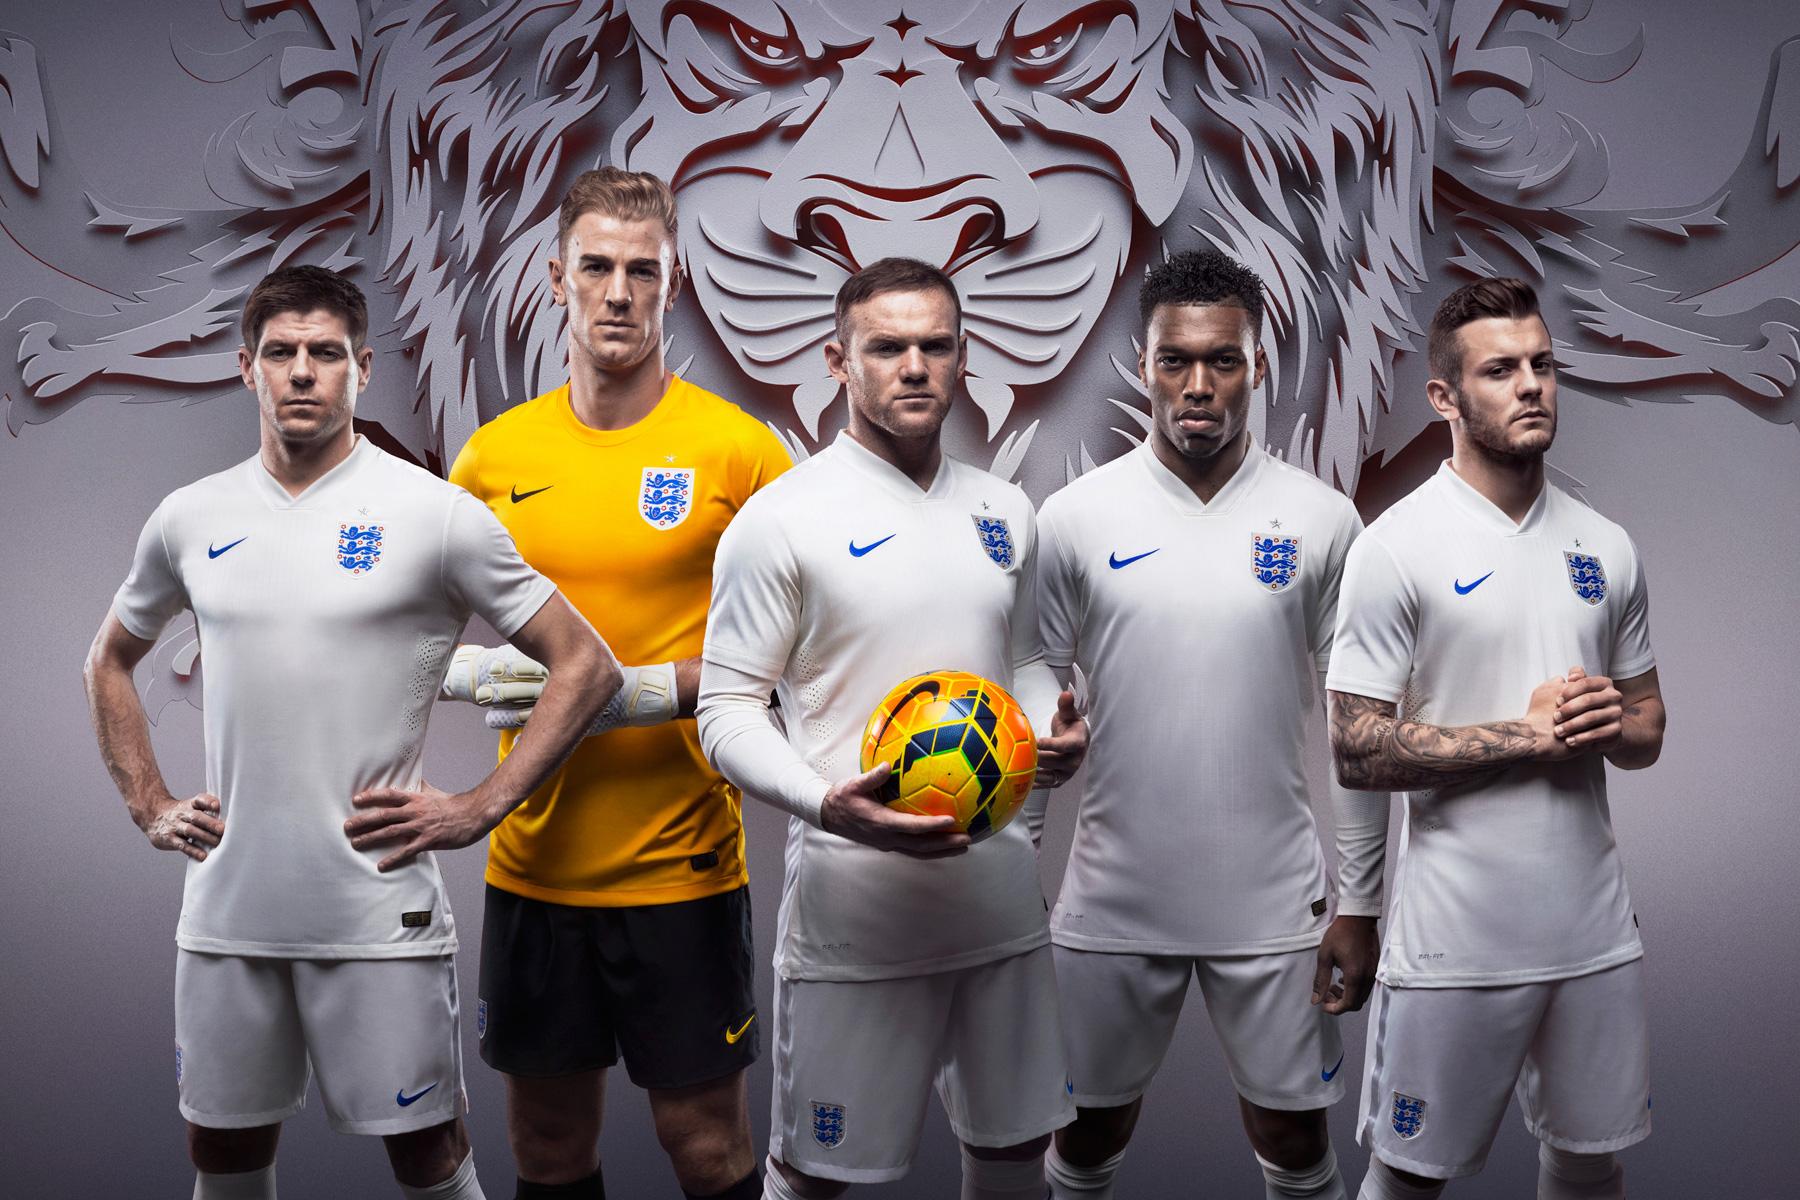 Nike Debuts England's New Home and Away Kits for 2014